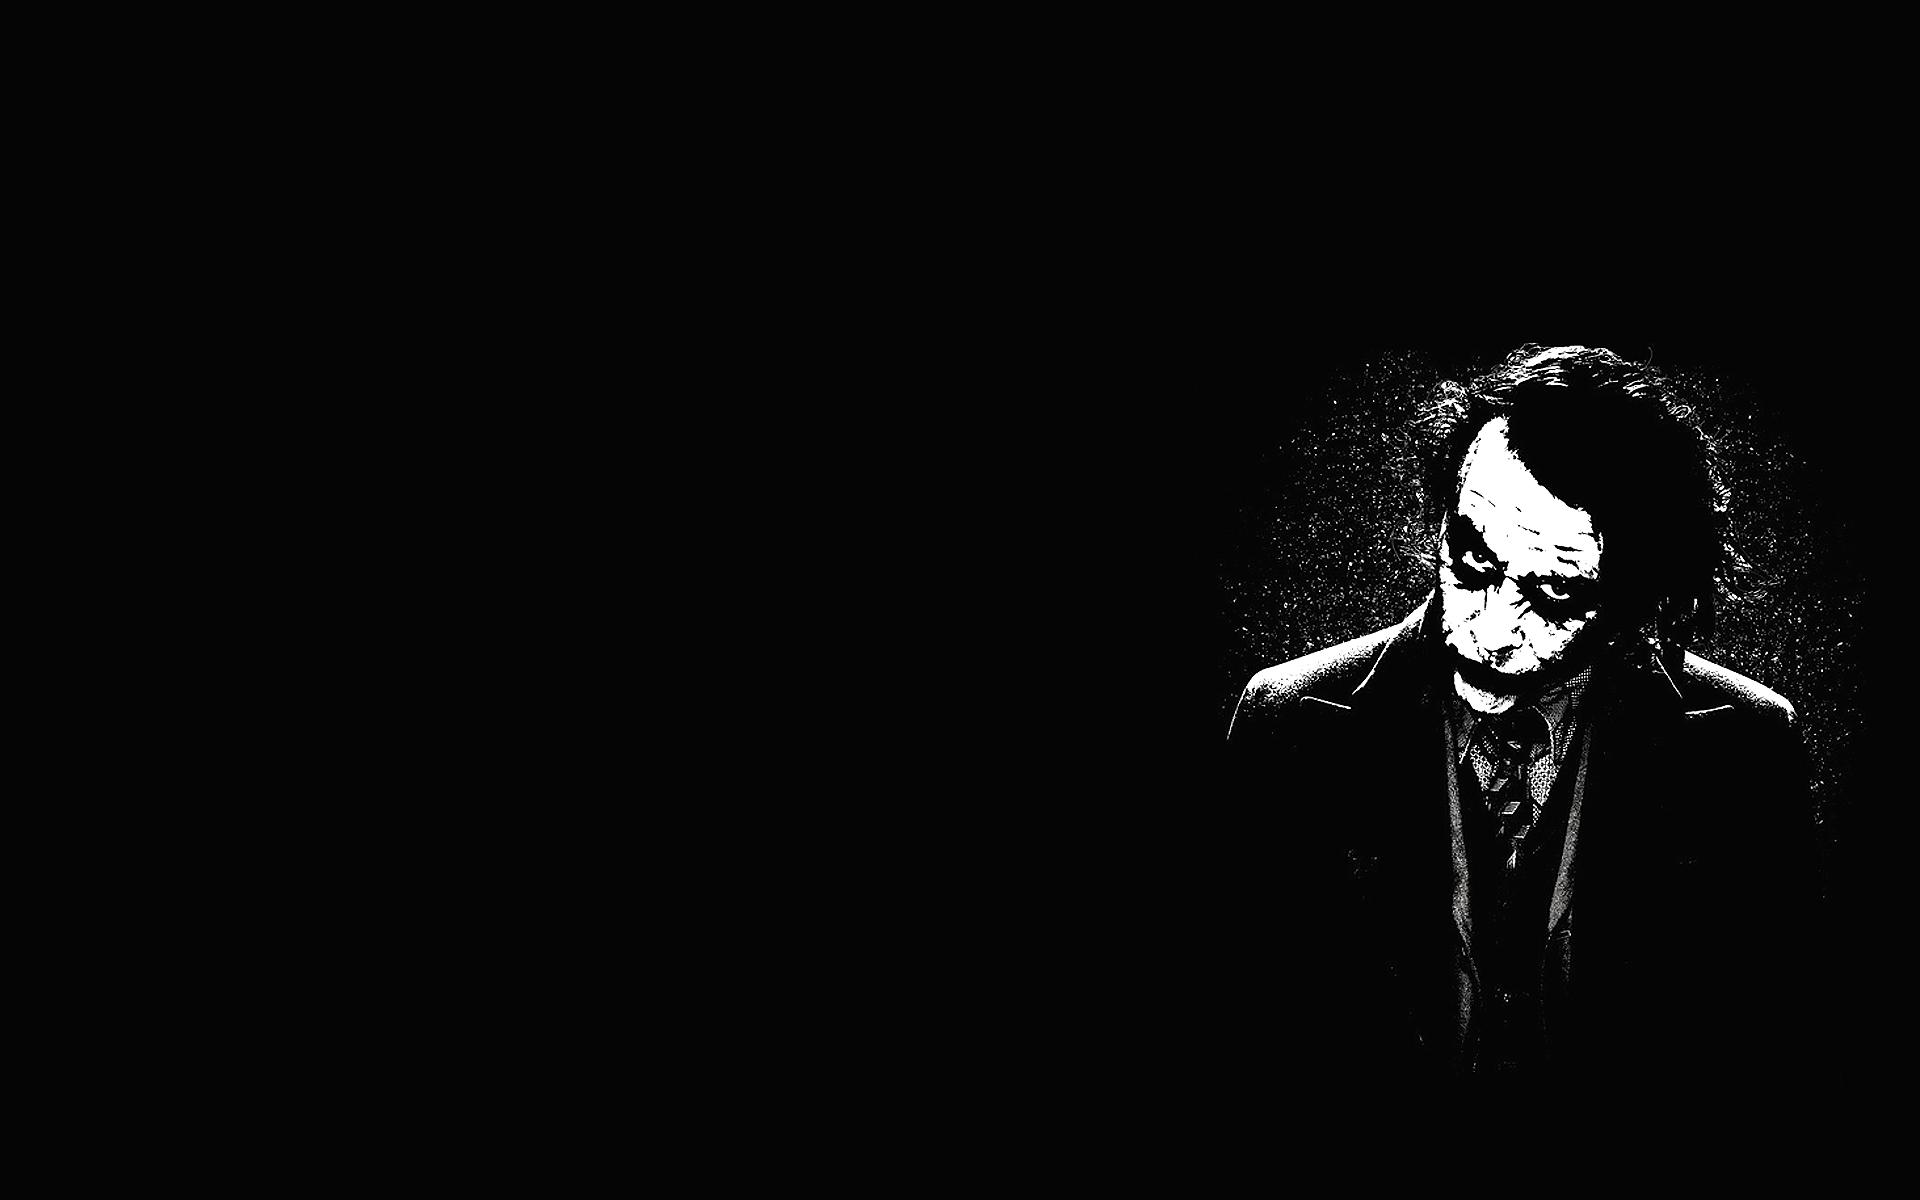 Black Joker Wallpapers Top Free Black Joker Backgrounds Wallpaperaccess